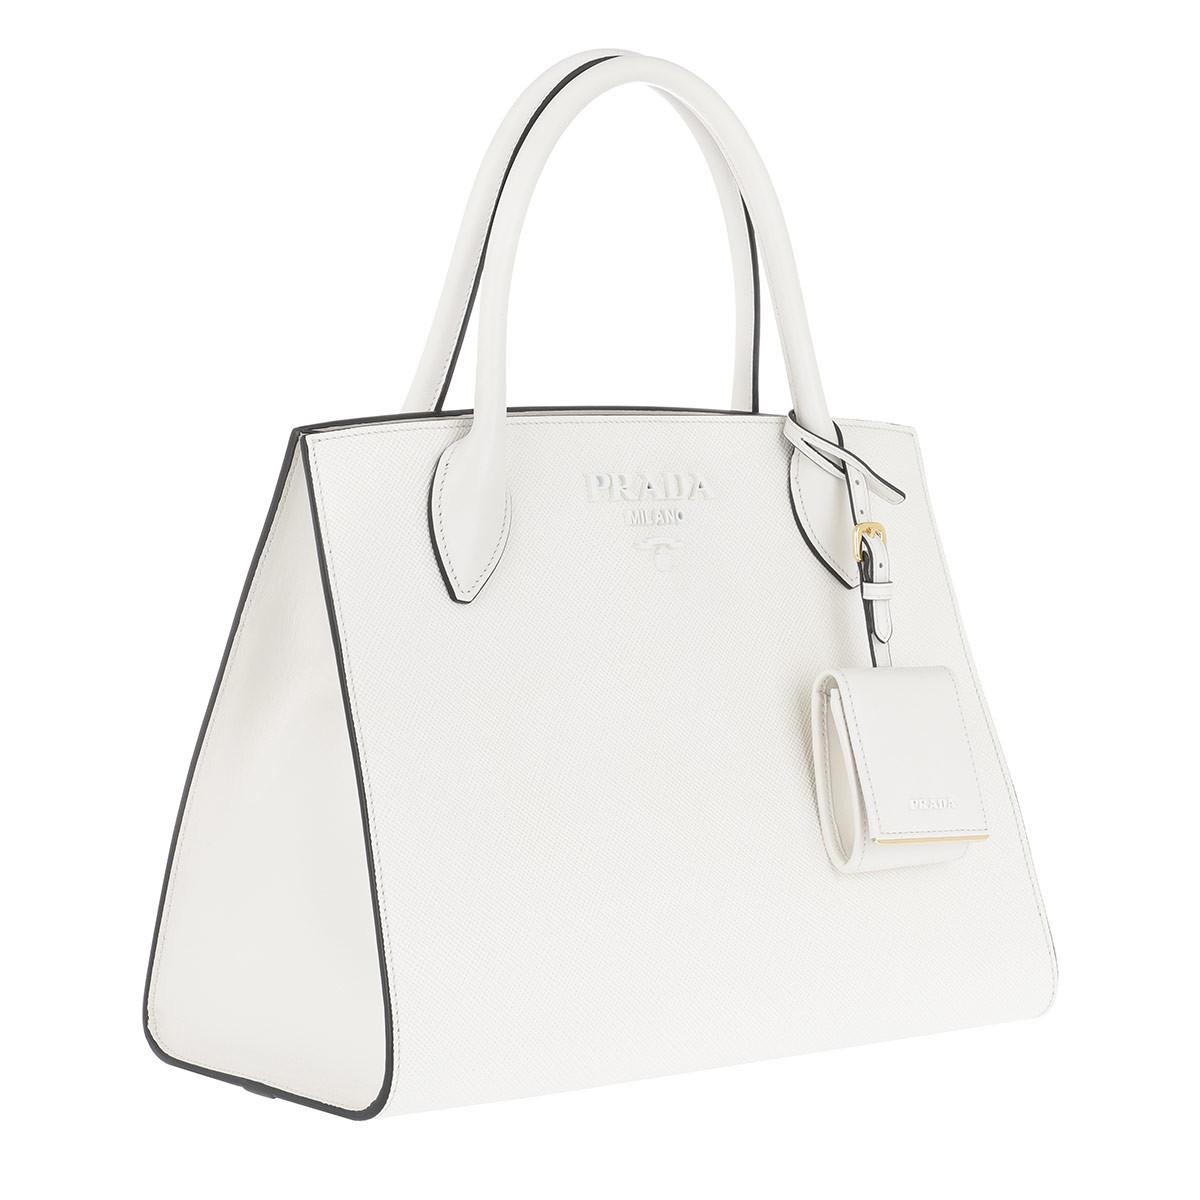 Tote - Monochrome Tote Bag Cipria - beige - Tote for ladies Prada M61xkHFgB1